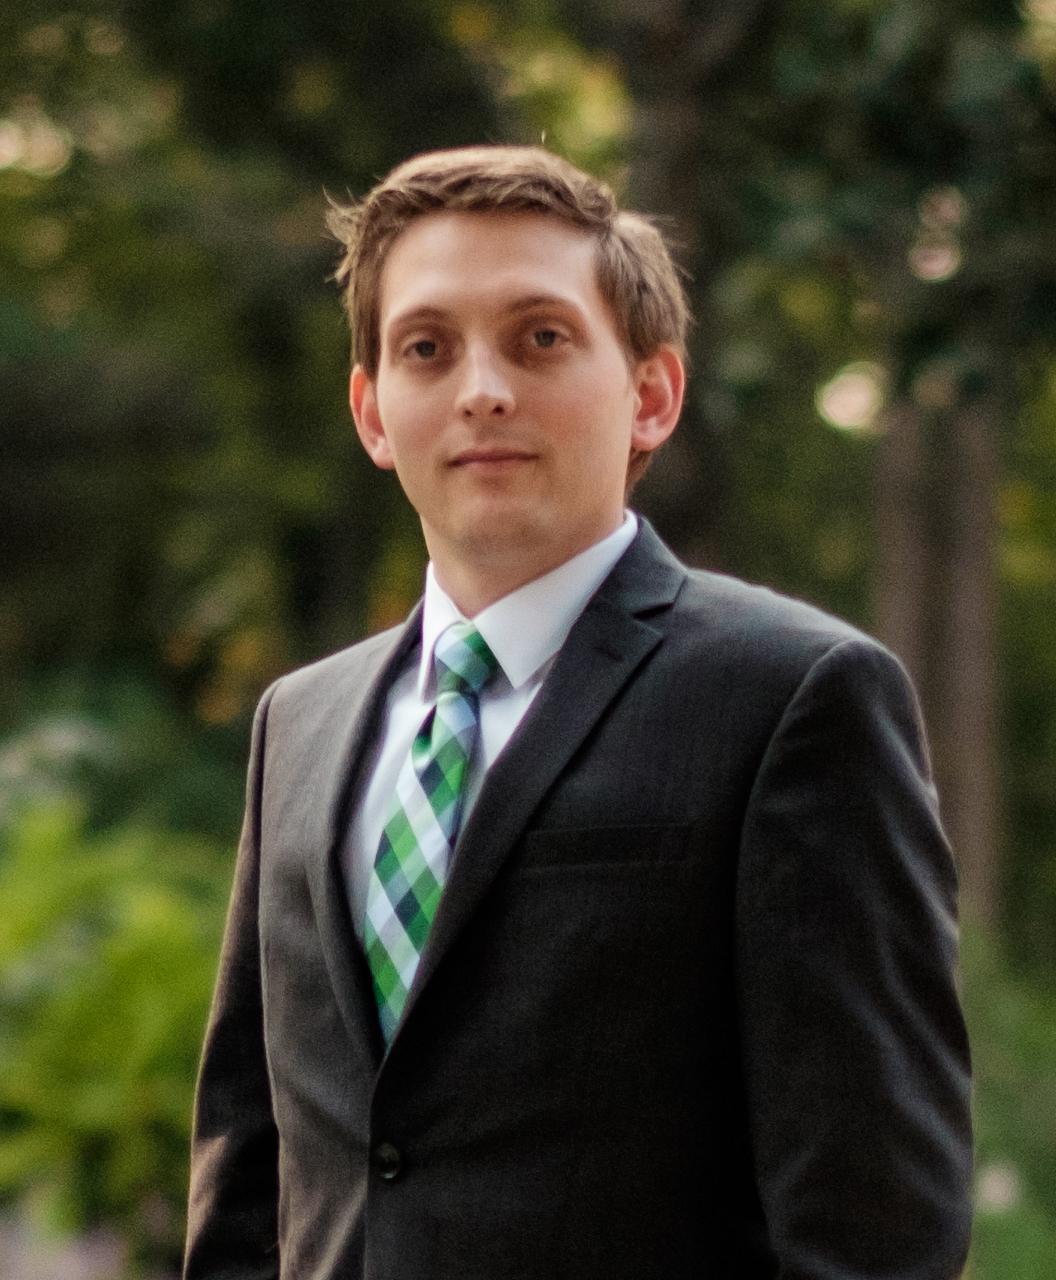 Erich Hellemann, M.S. : Graduate Student